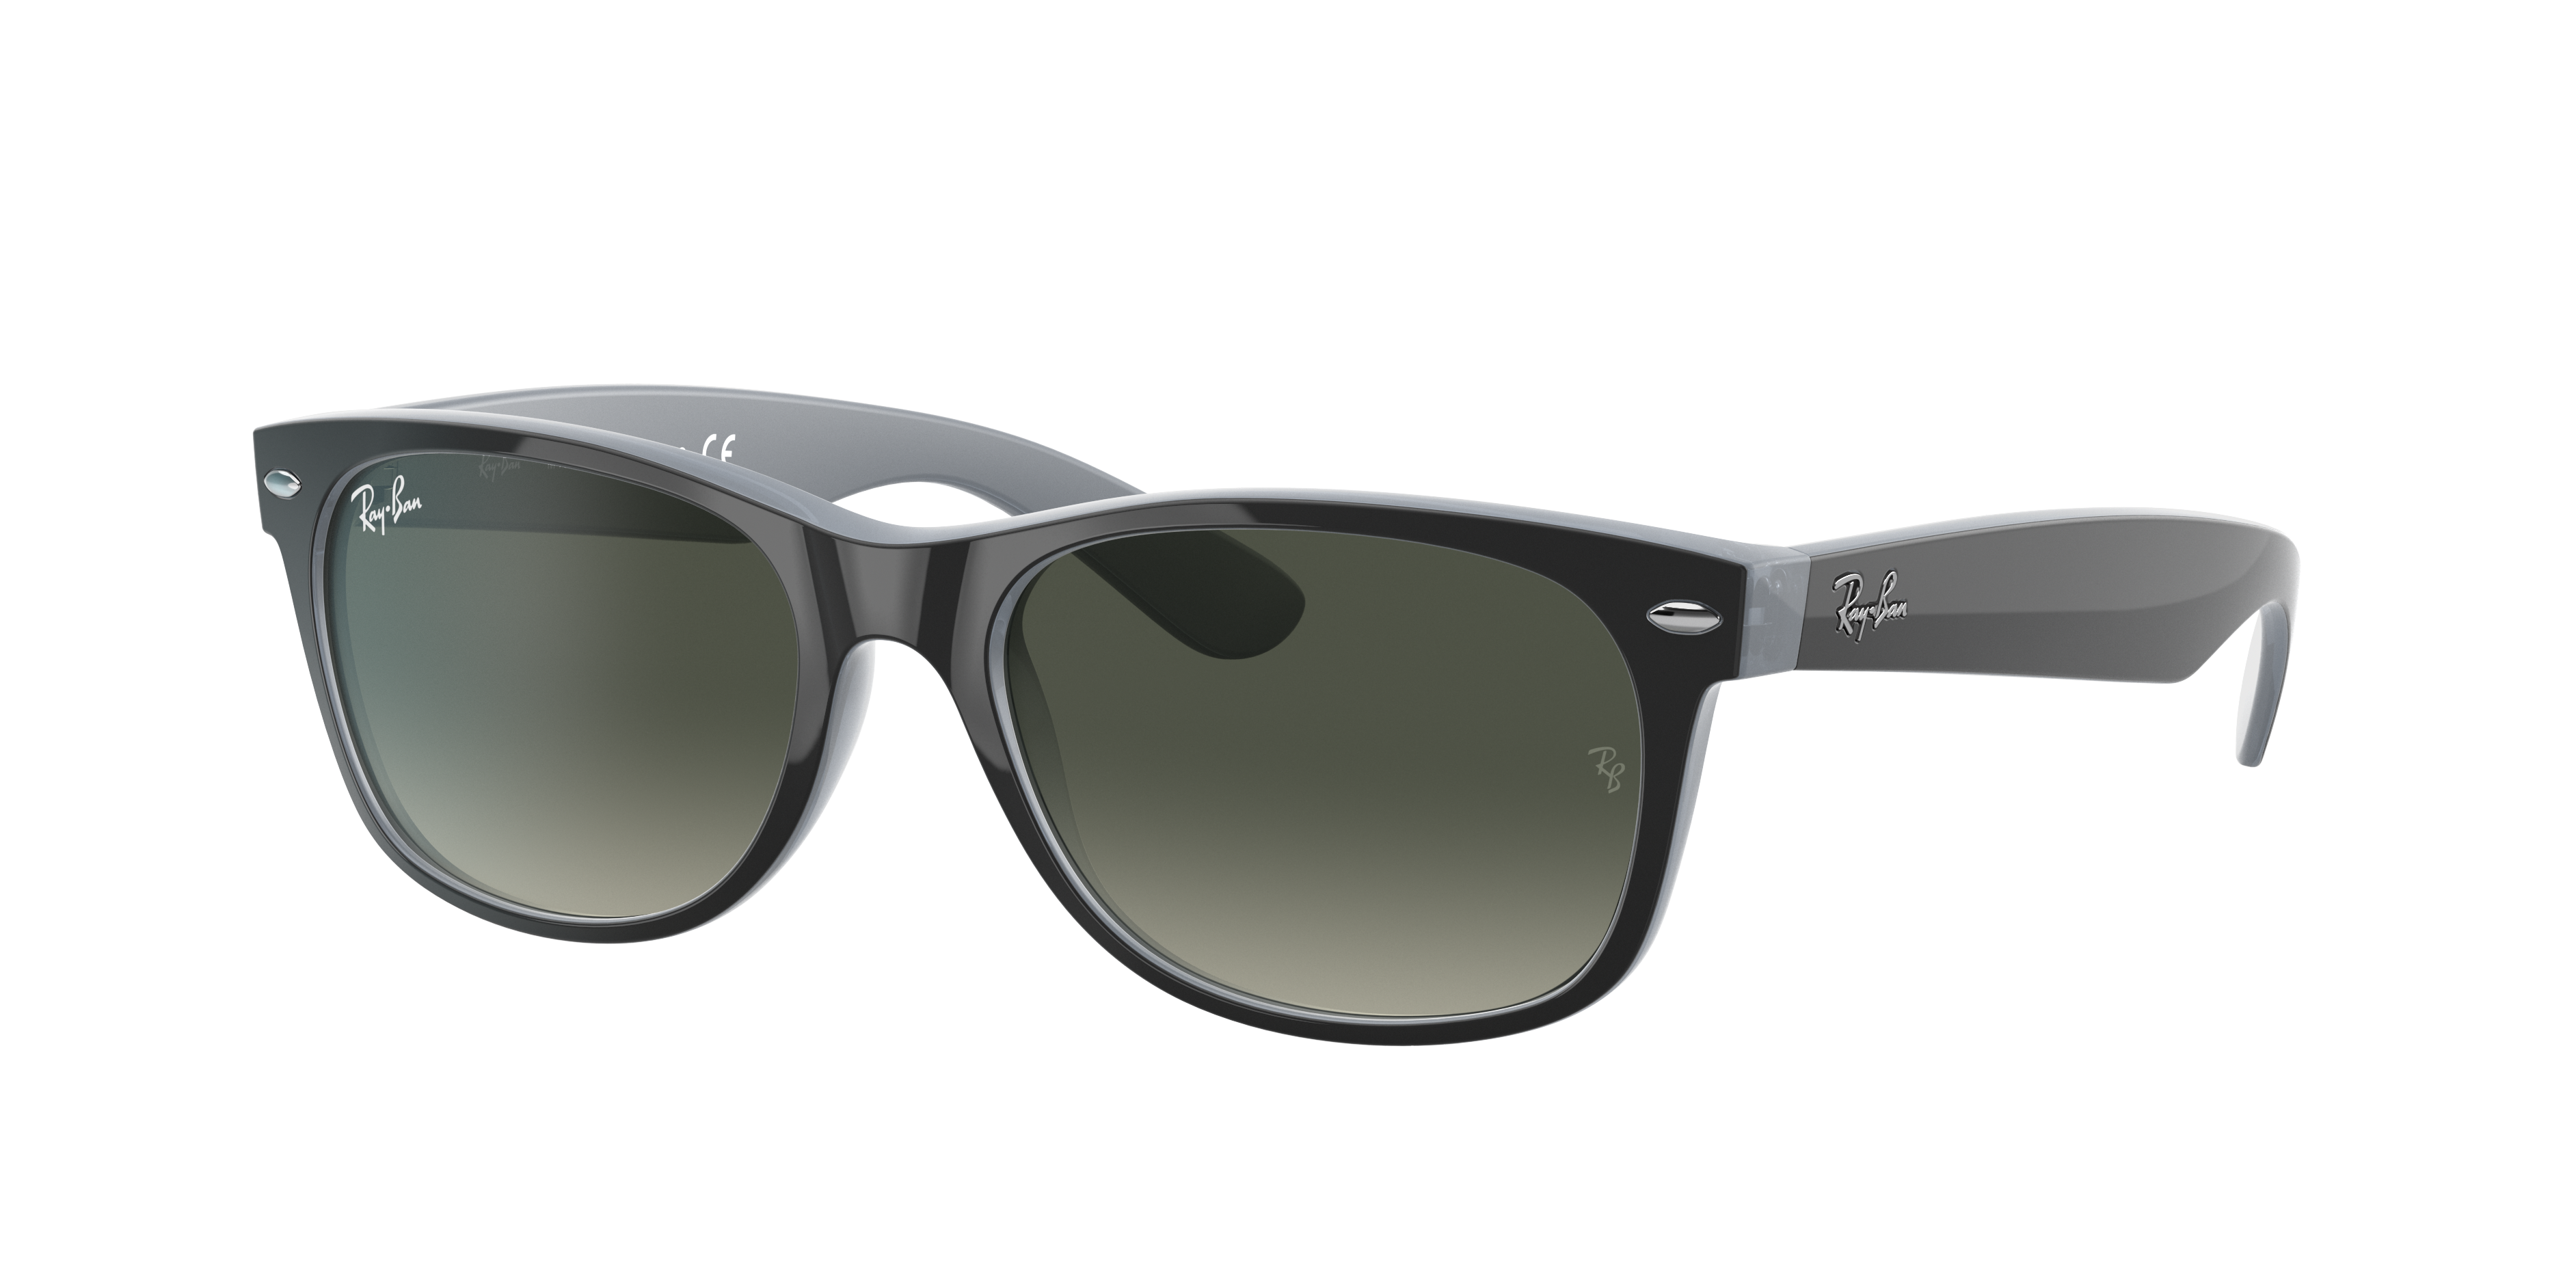 Ray-Ban New Wayfarer Color Mix Black, Gray Lenses - RB2132